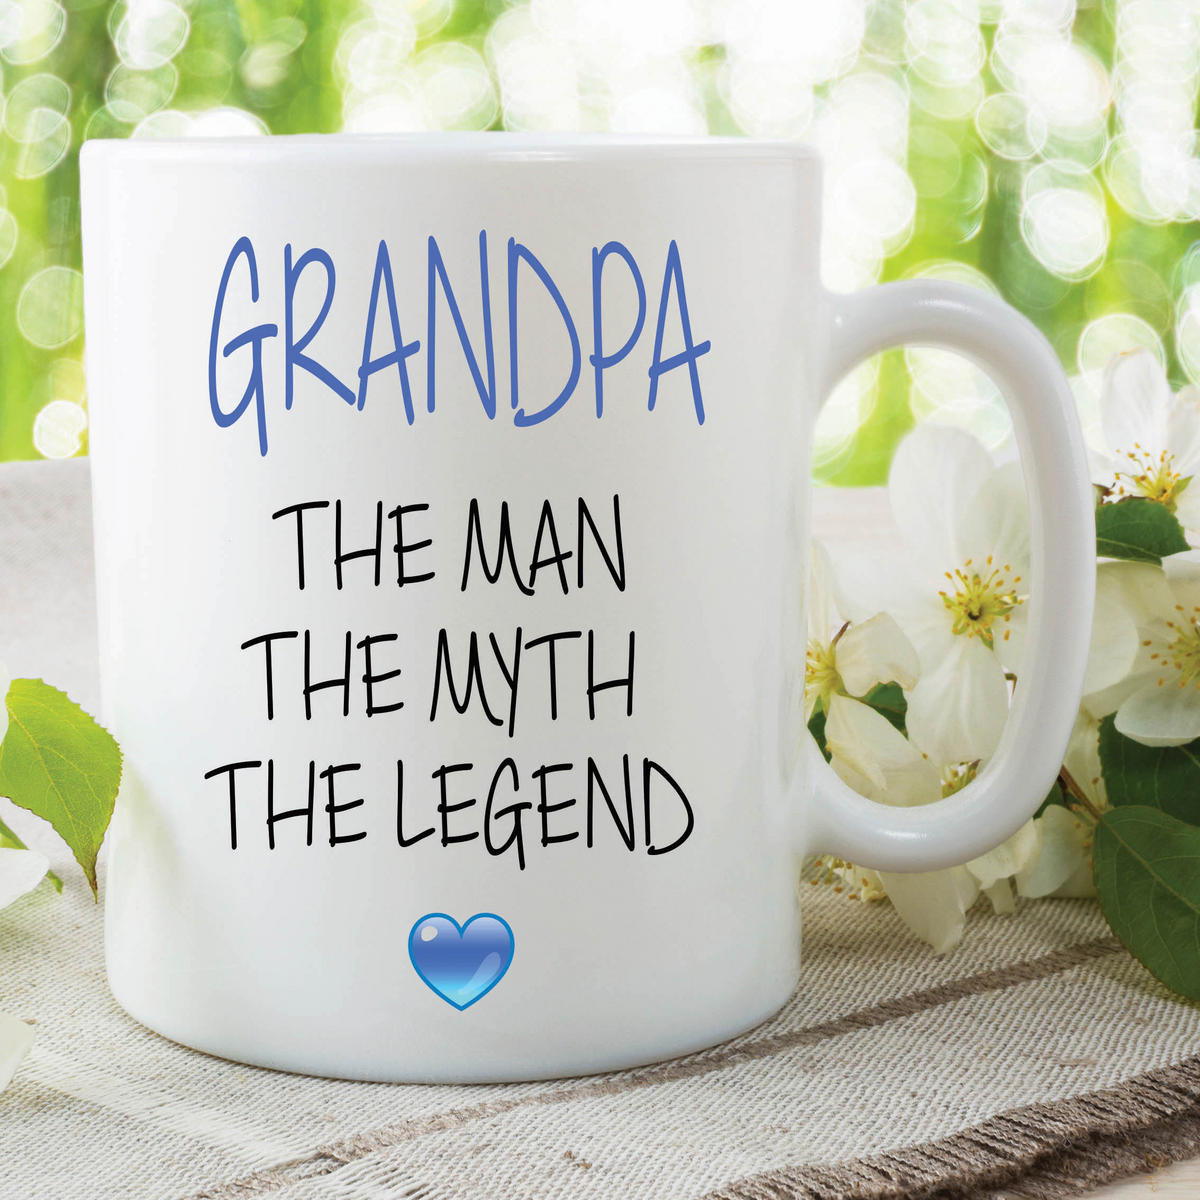 Novelty Grandpa Mug The Man The Myth The Legend Gift Fathers Day Cup WSDMUG639